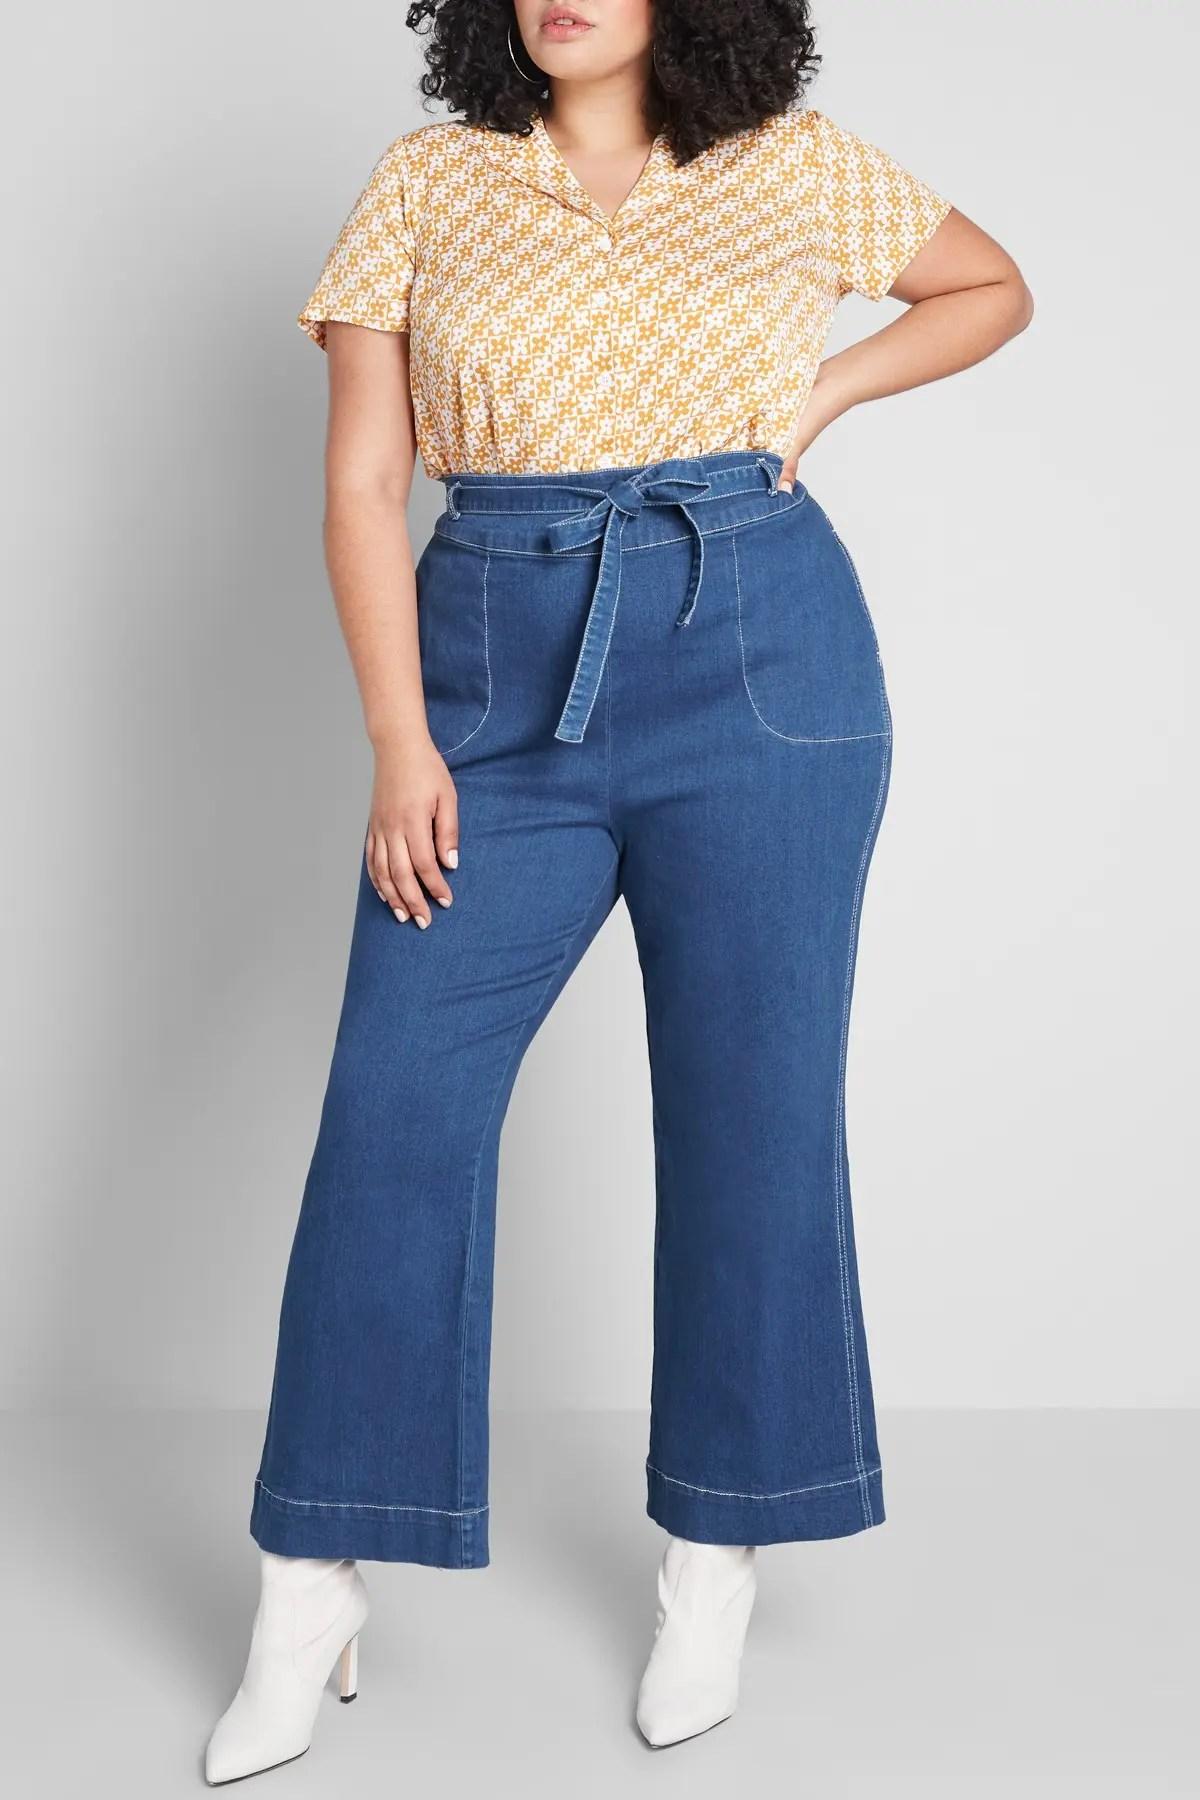 jeans denim nordstrom rack